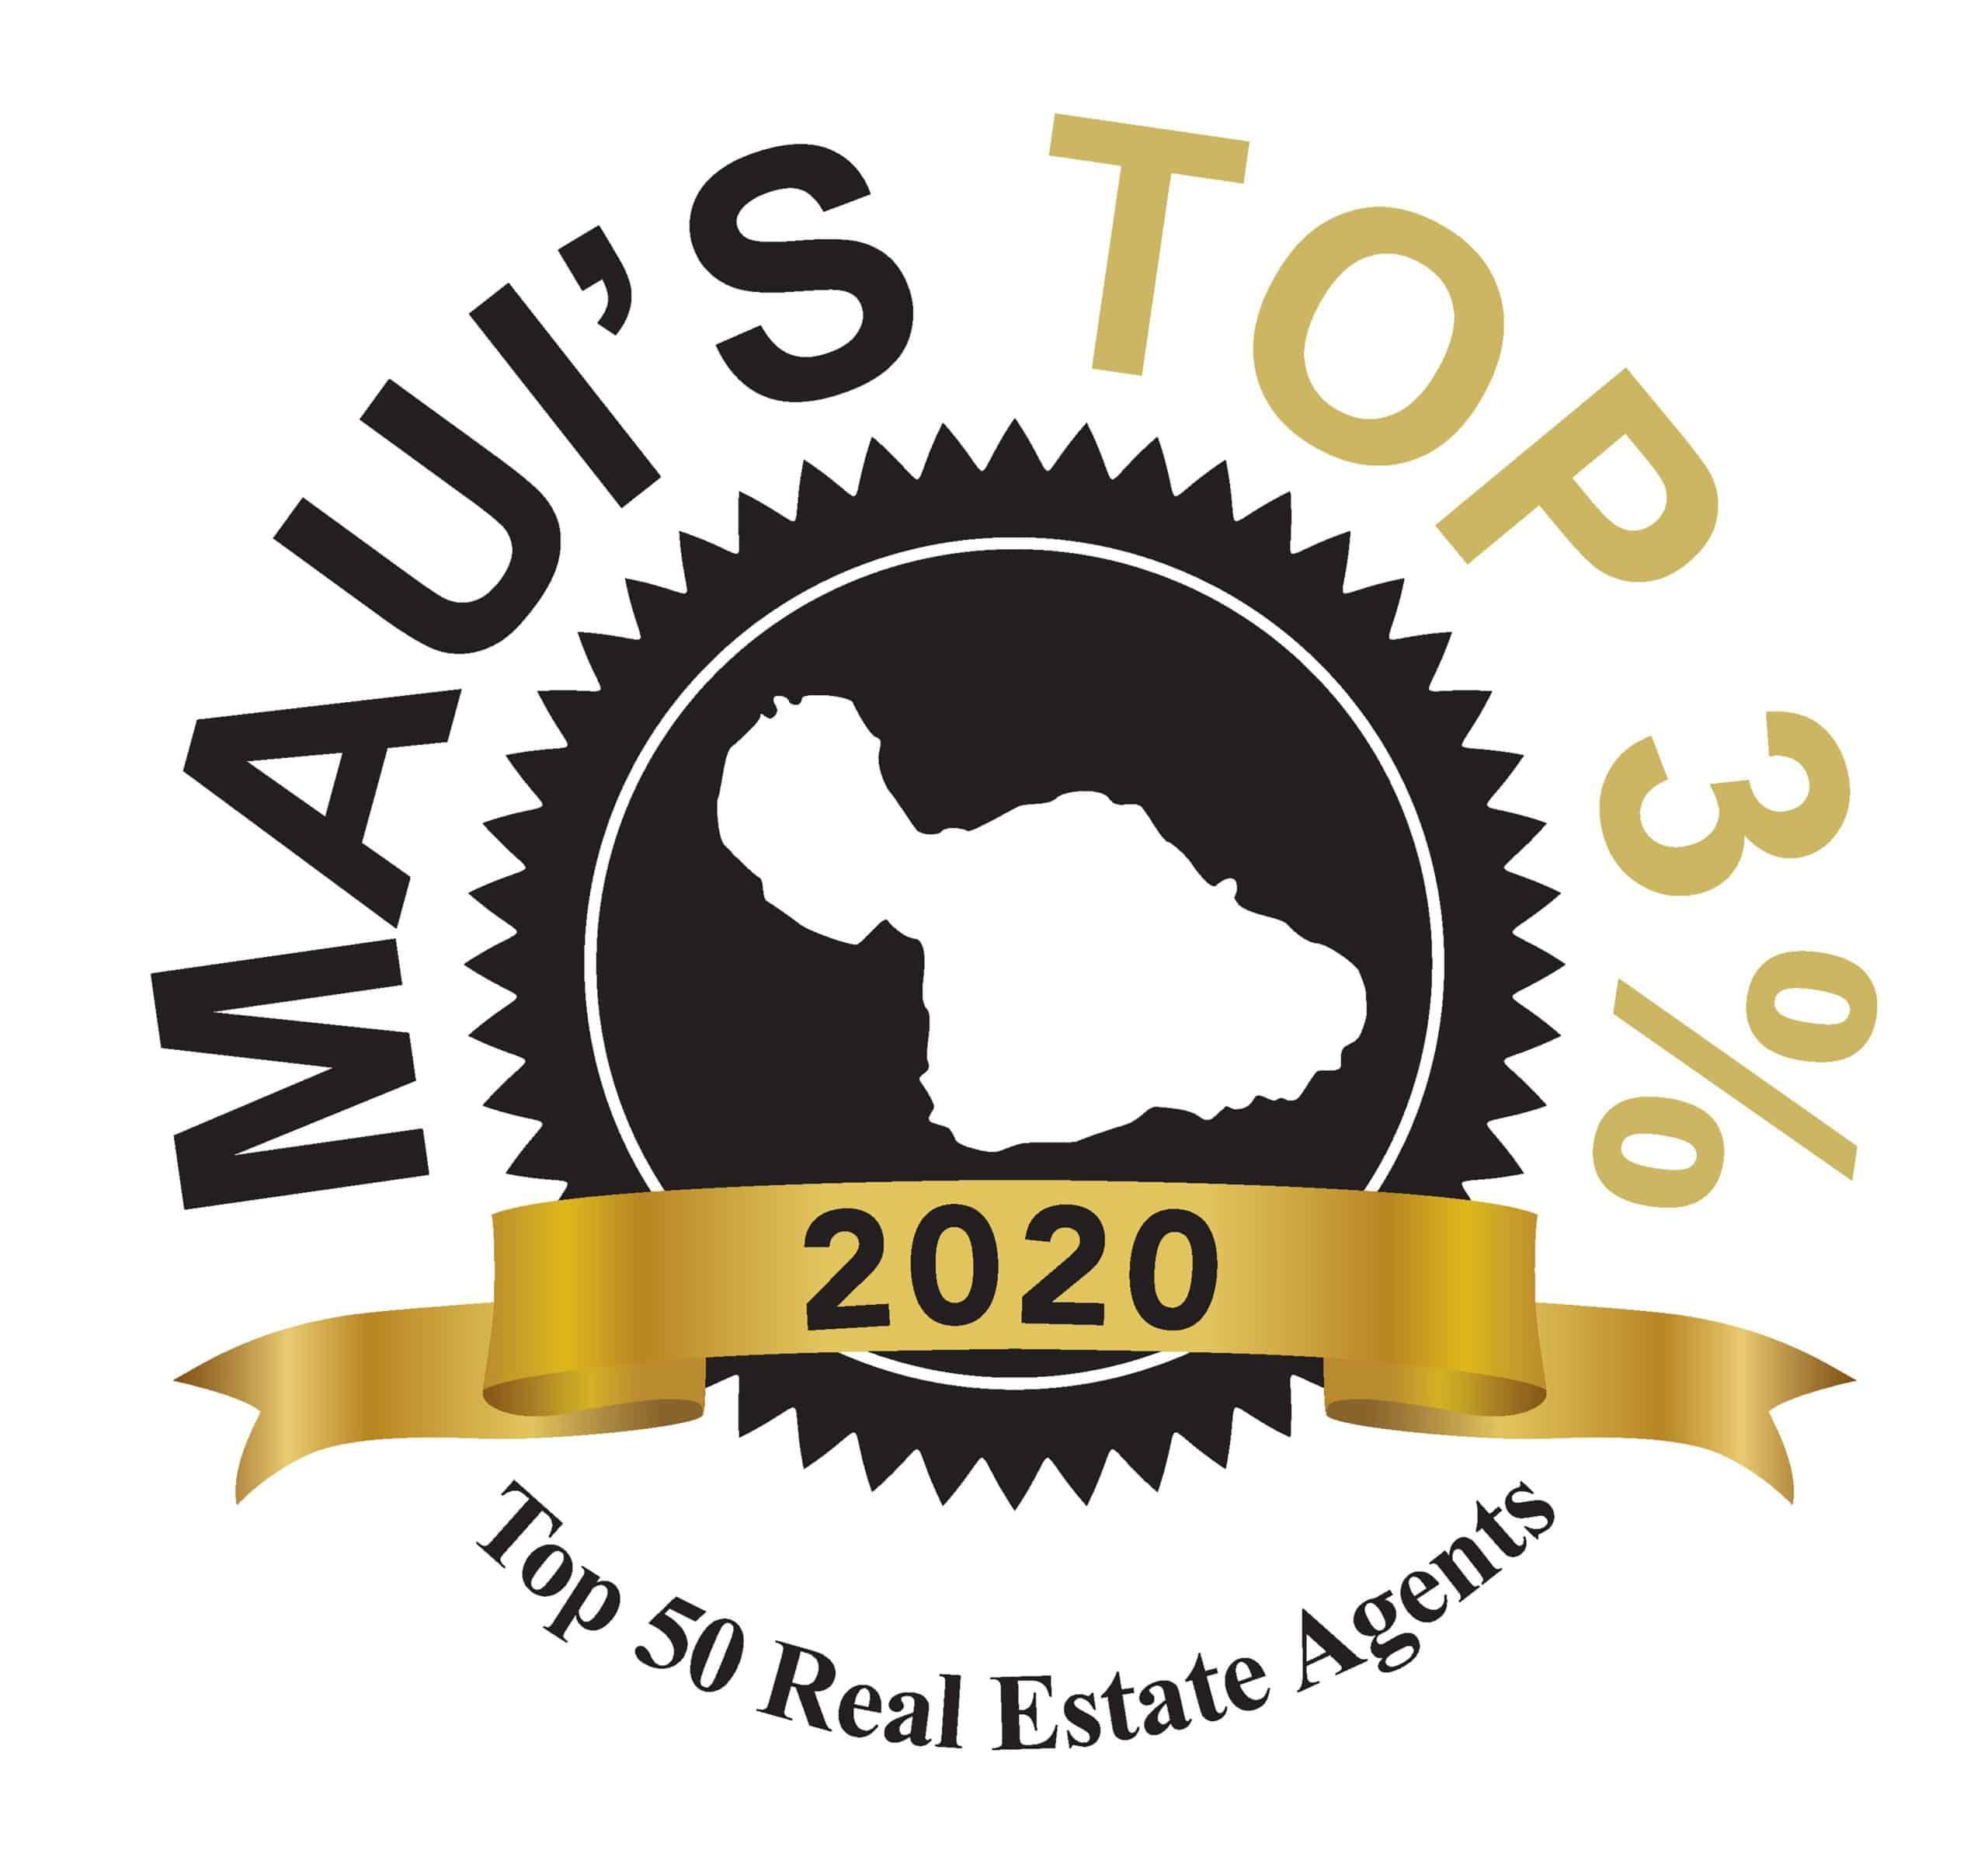 Dave Futch Maui Top 3% 2020 LOGO